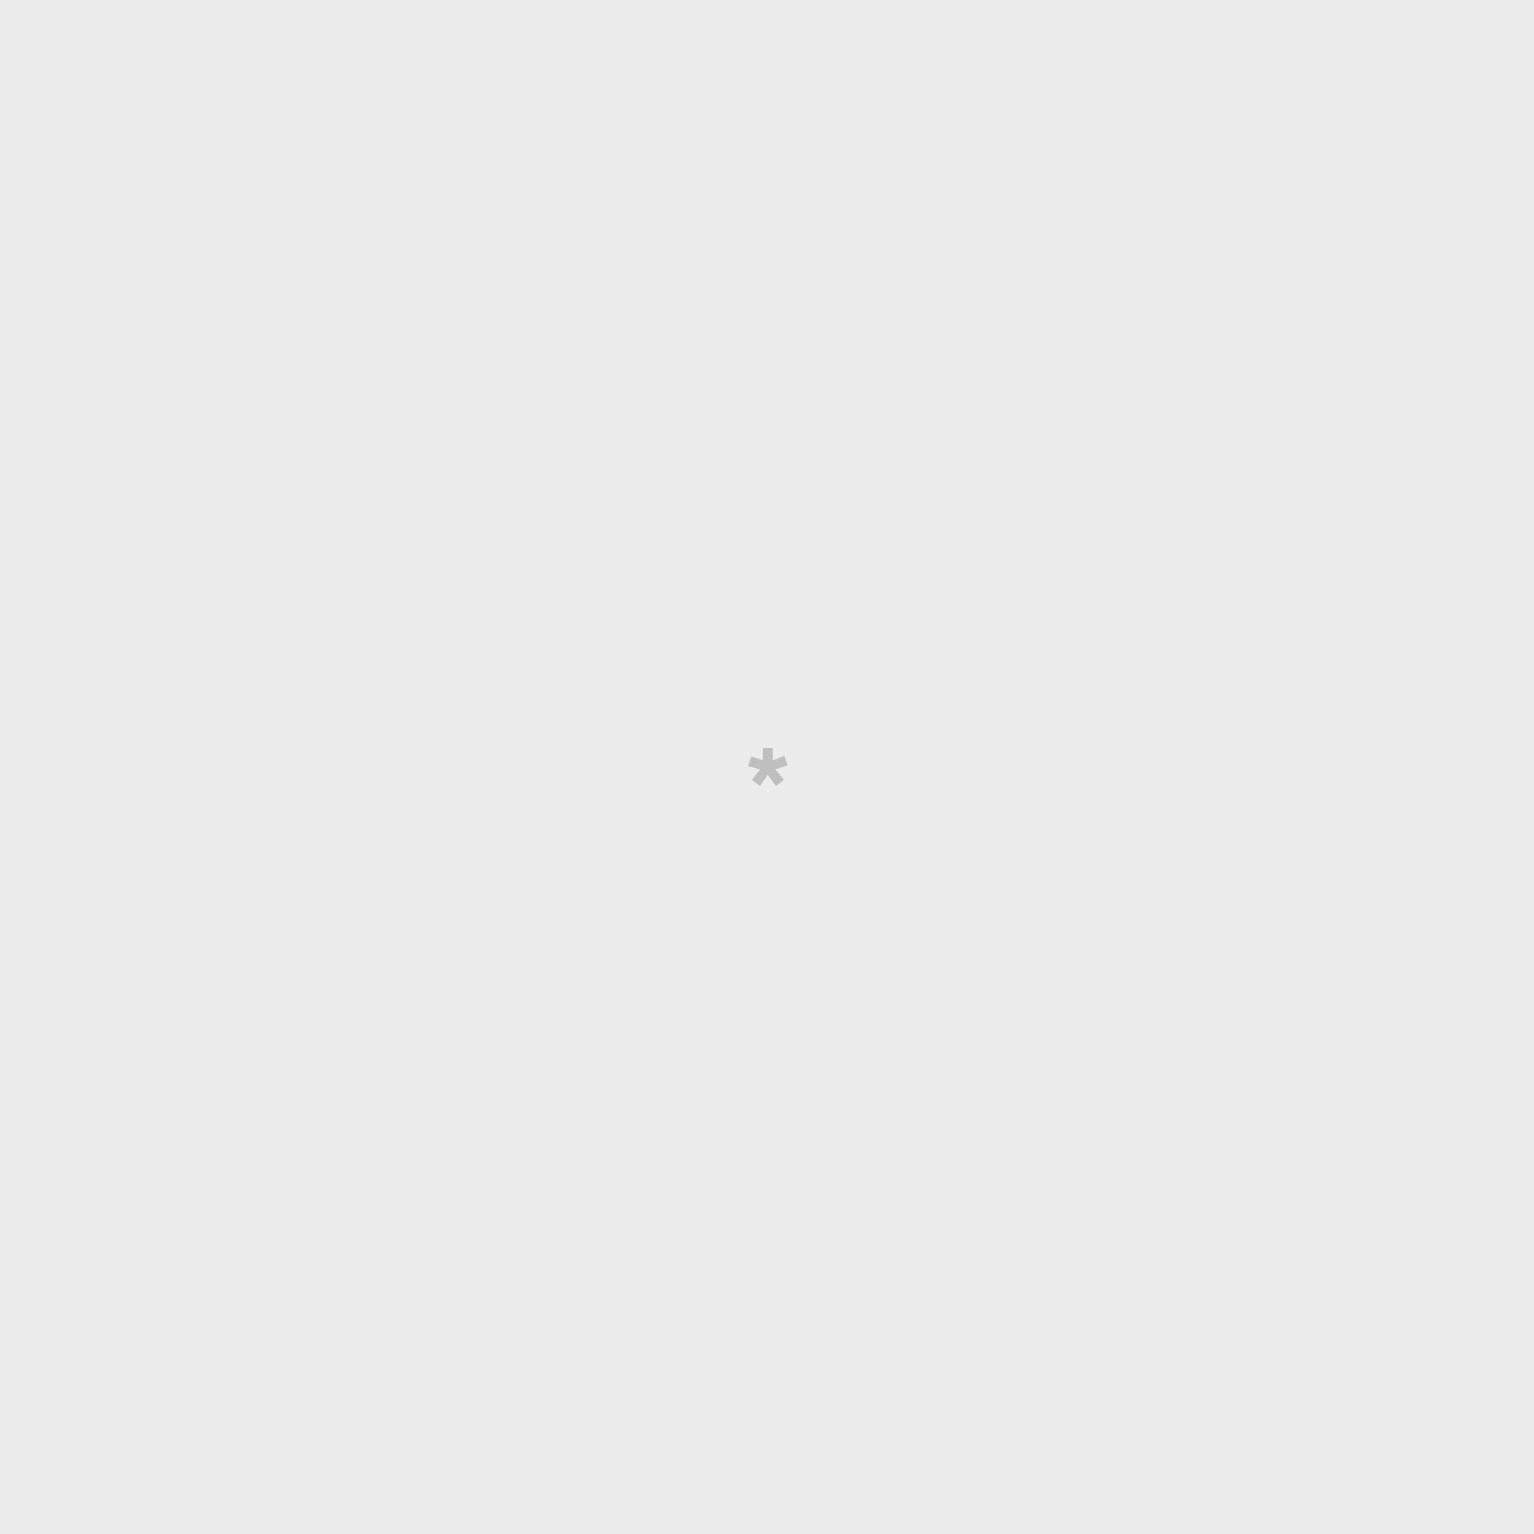 Watch - Make today amazing